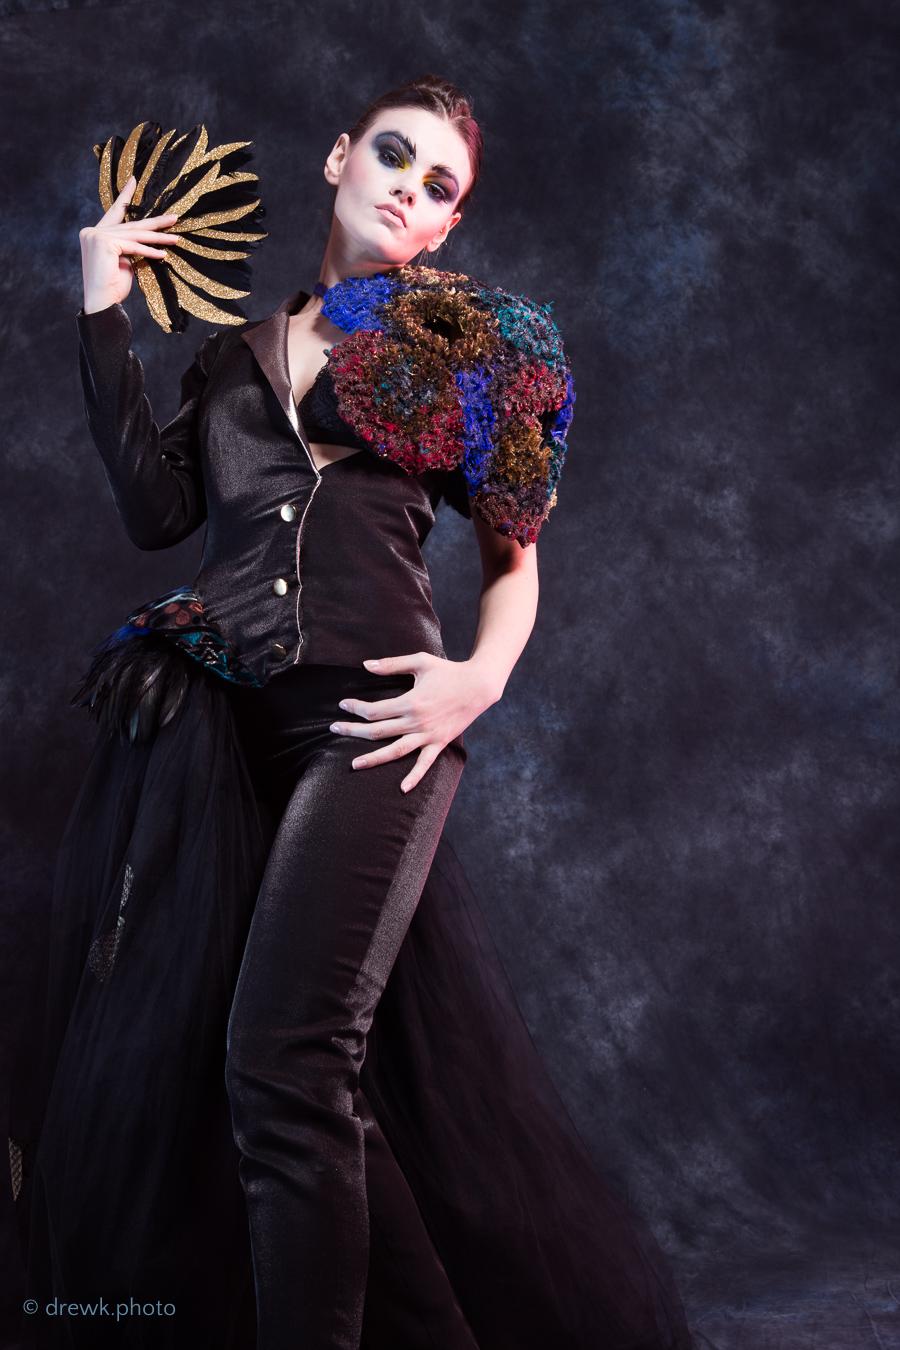 <alt>Simourgh - Nazira Muslem, BA (Hons) Fashion Design</alt><br/>